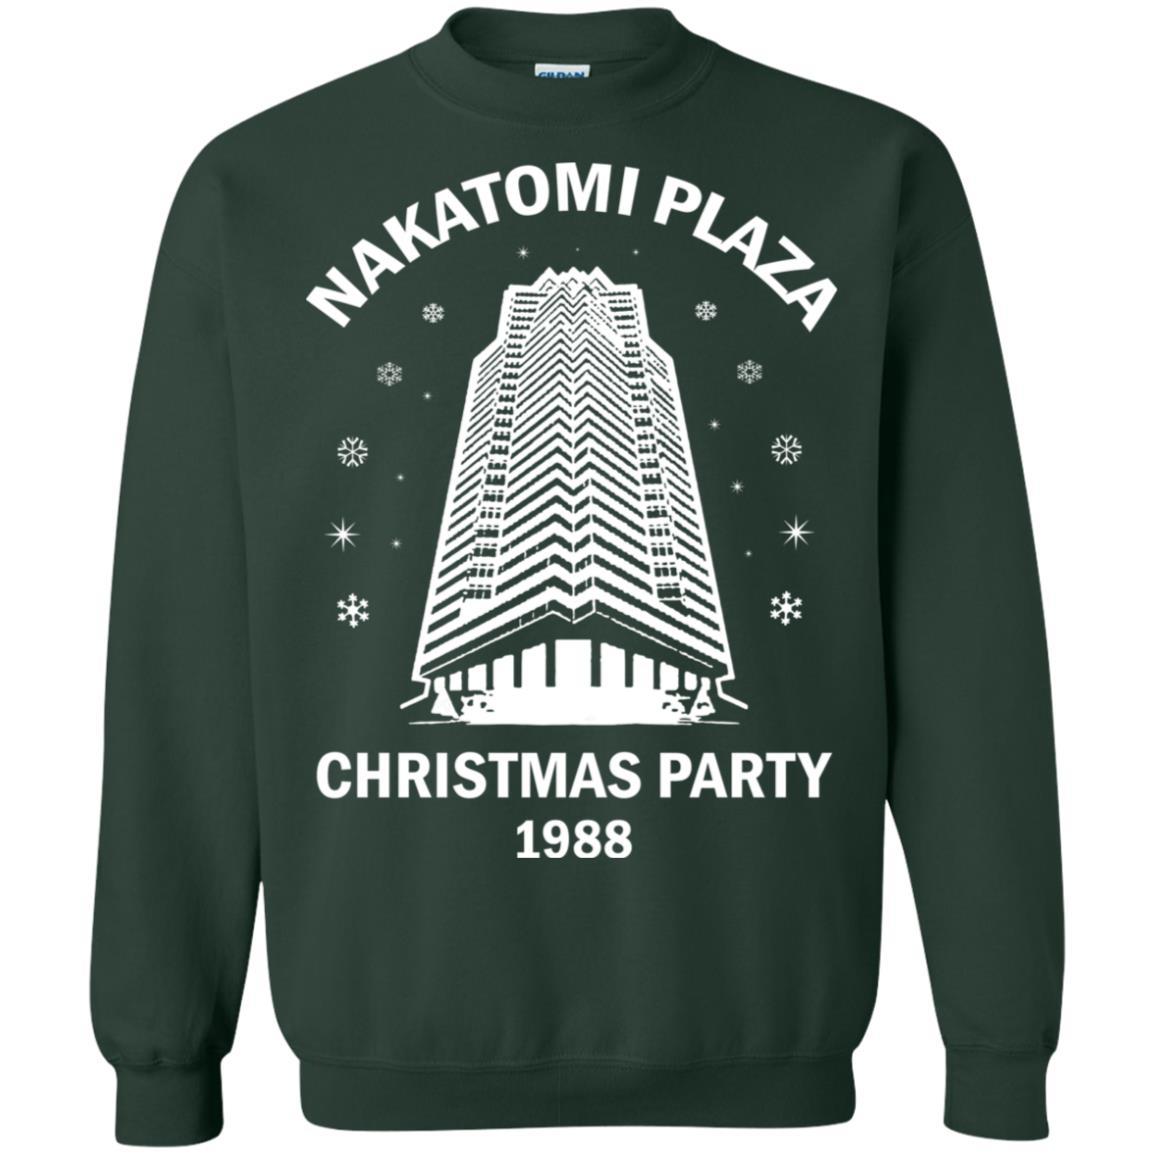 357cad3e9 Nakatomi Christmas Party 1988 Ugly Christmas Sweater shirt - image 184  510x510